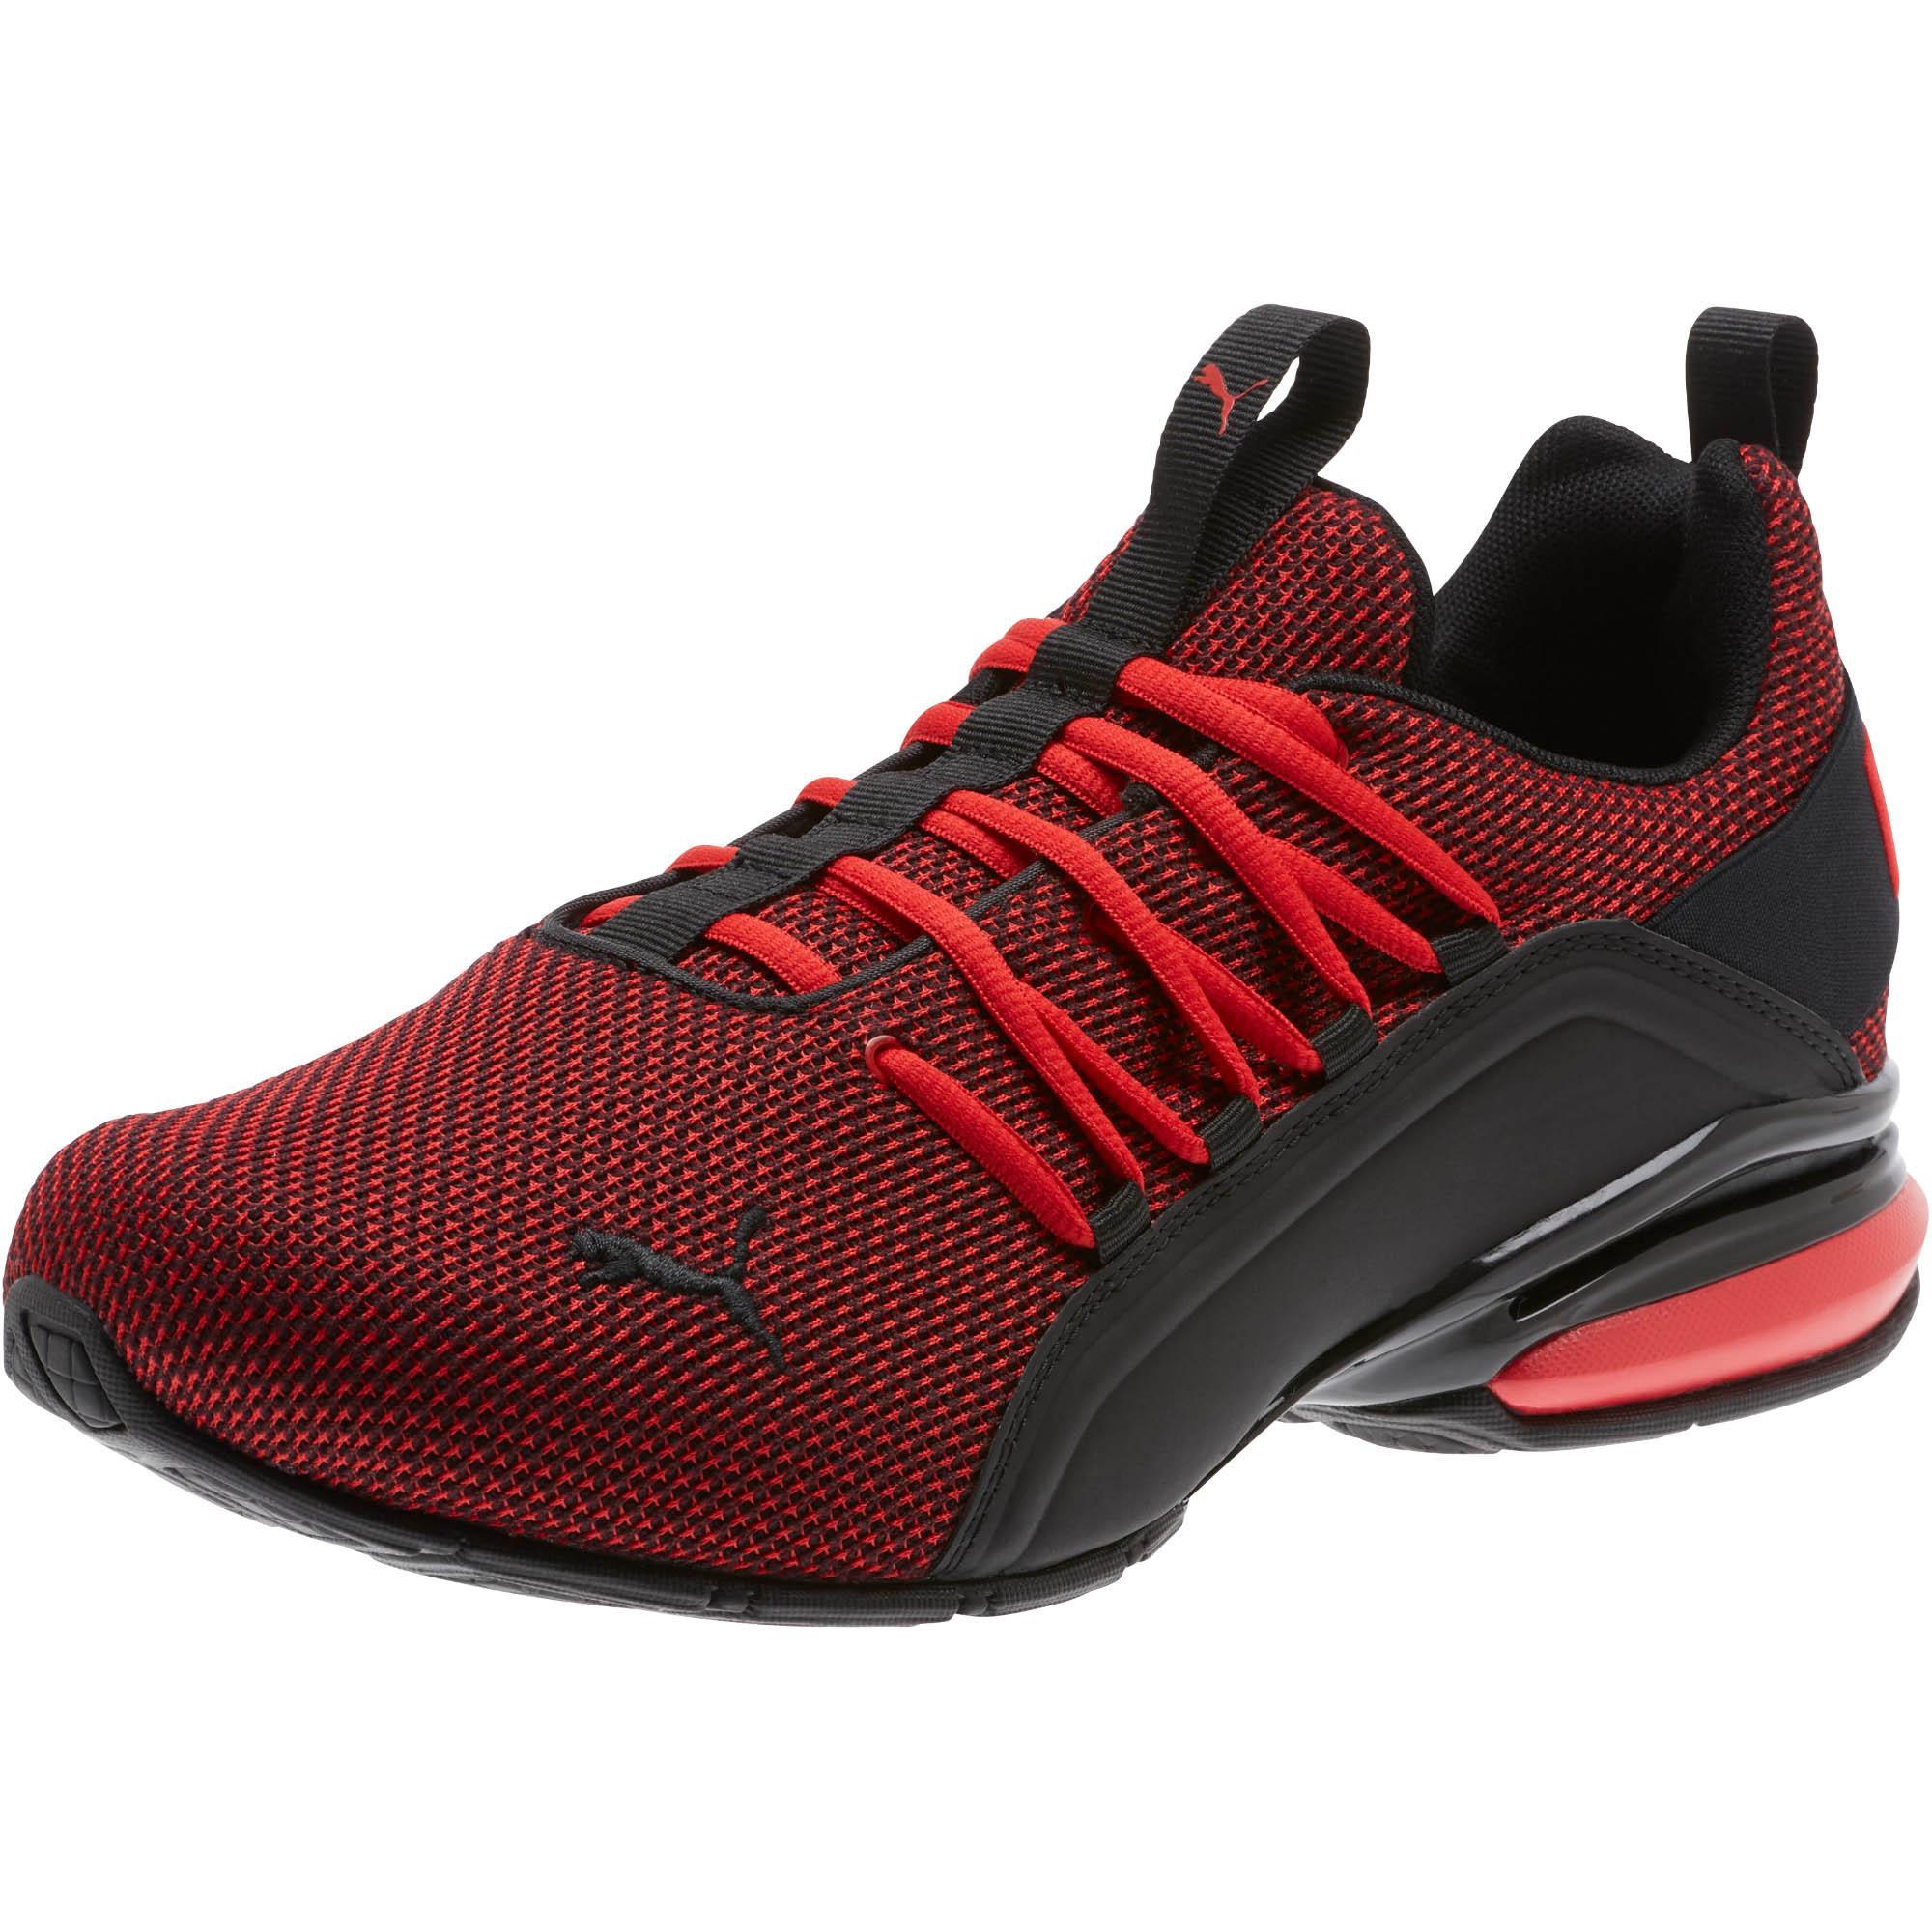 cadbca40b7fd4 PUMA Axelion Mesh (high Risk Red/ Black) Shoes for men